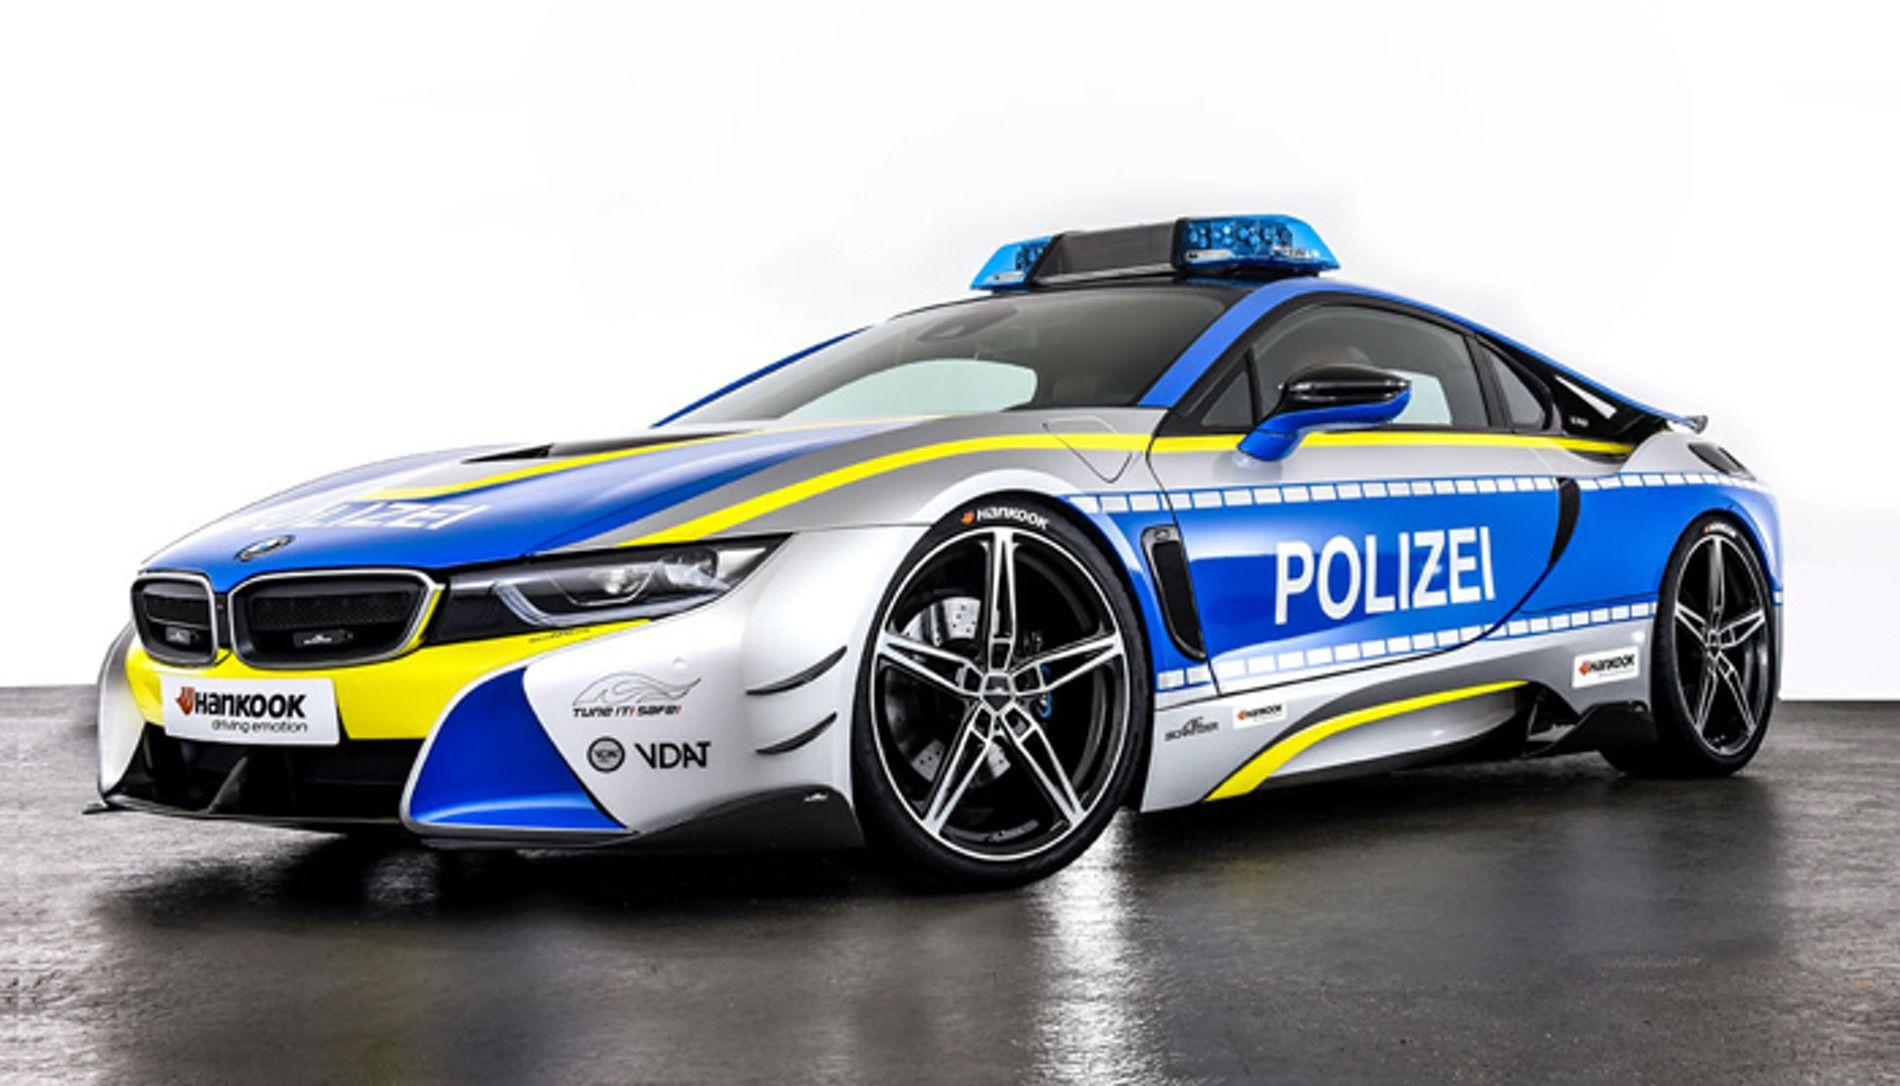 BMW i8 AC Schnitzer Police Car 03